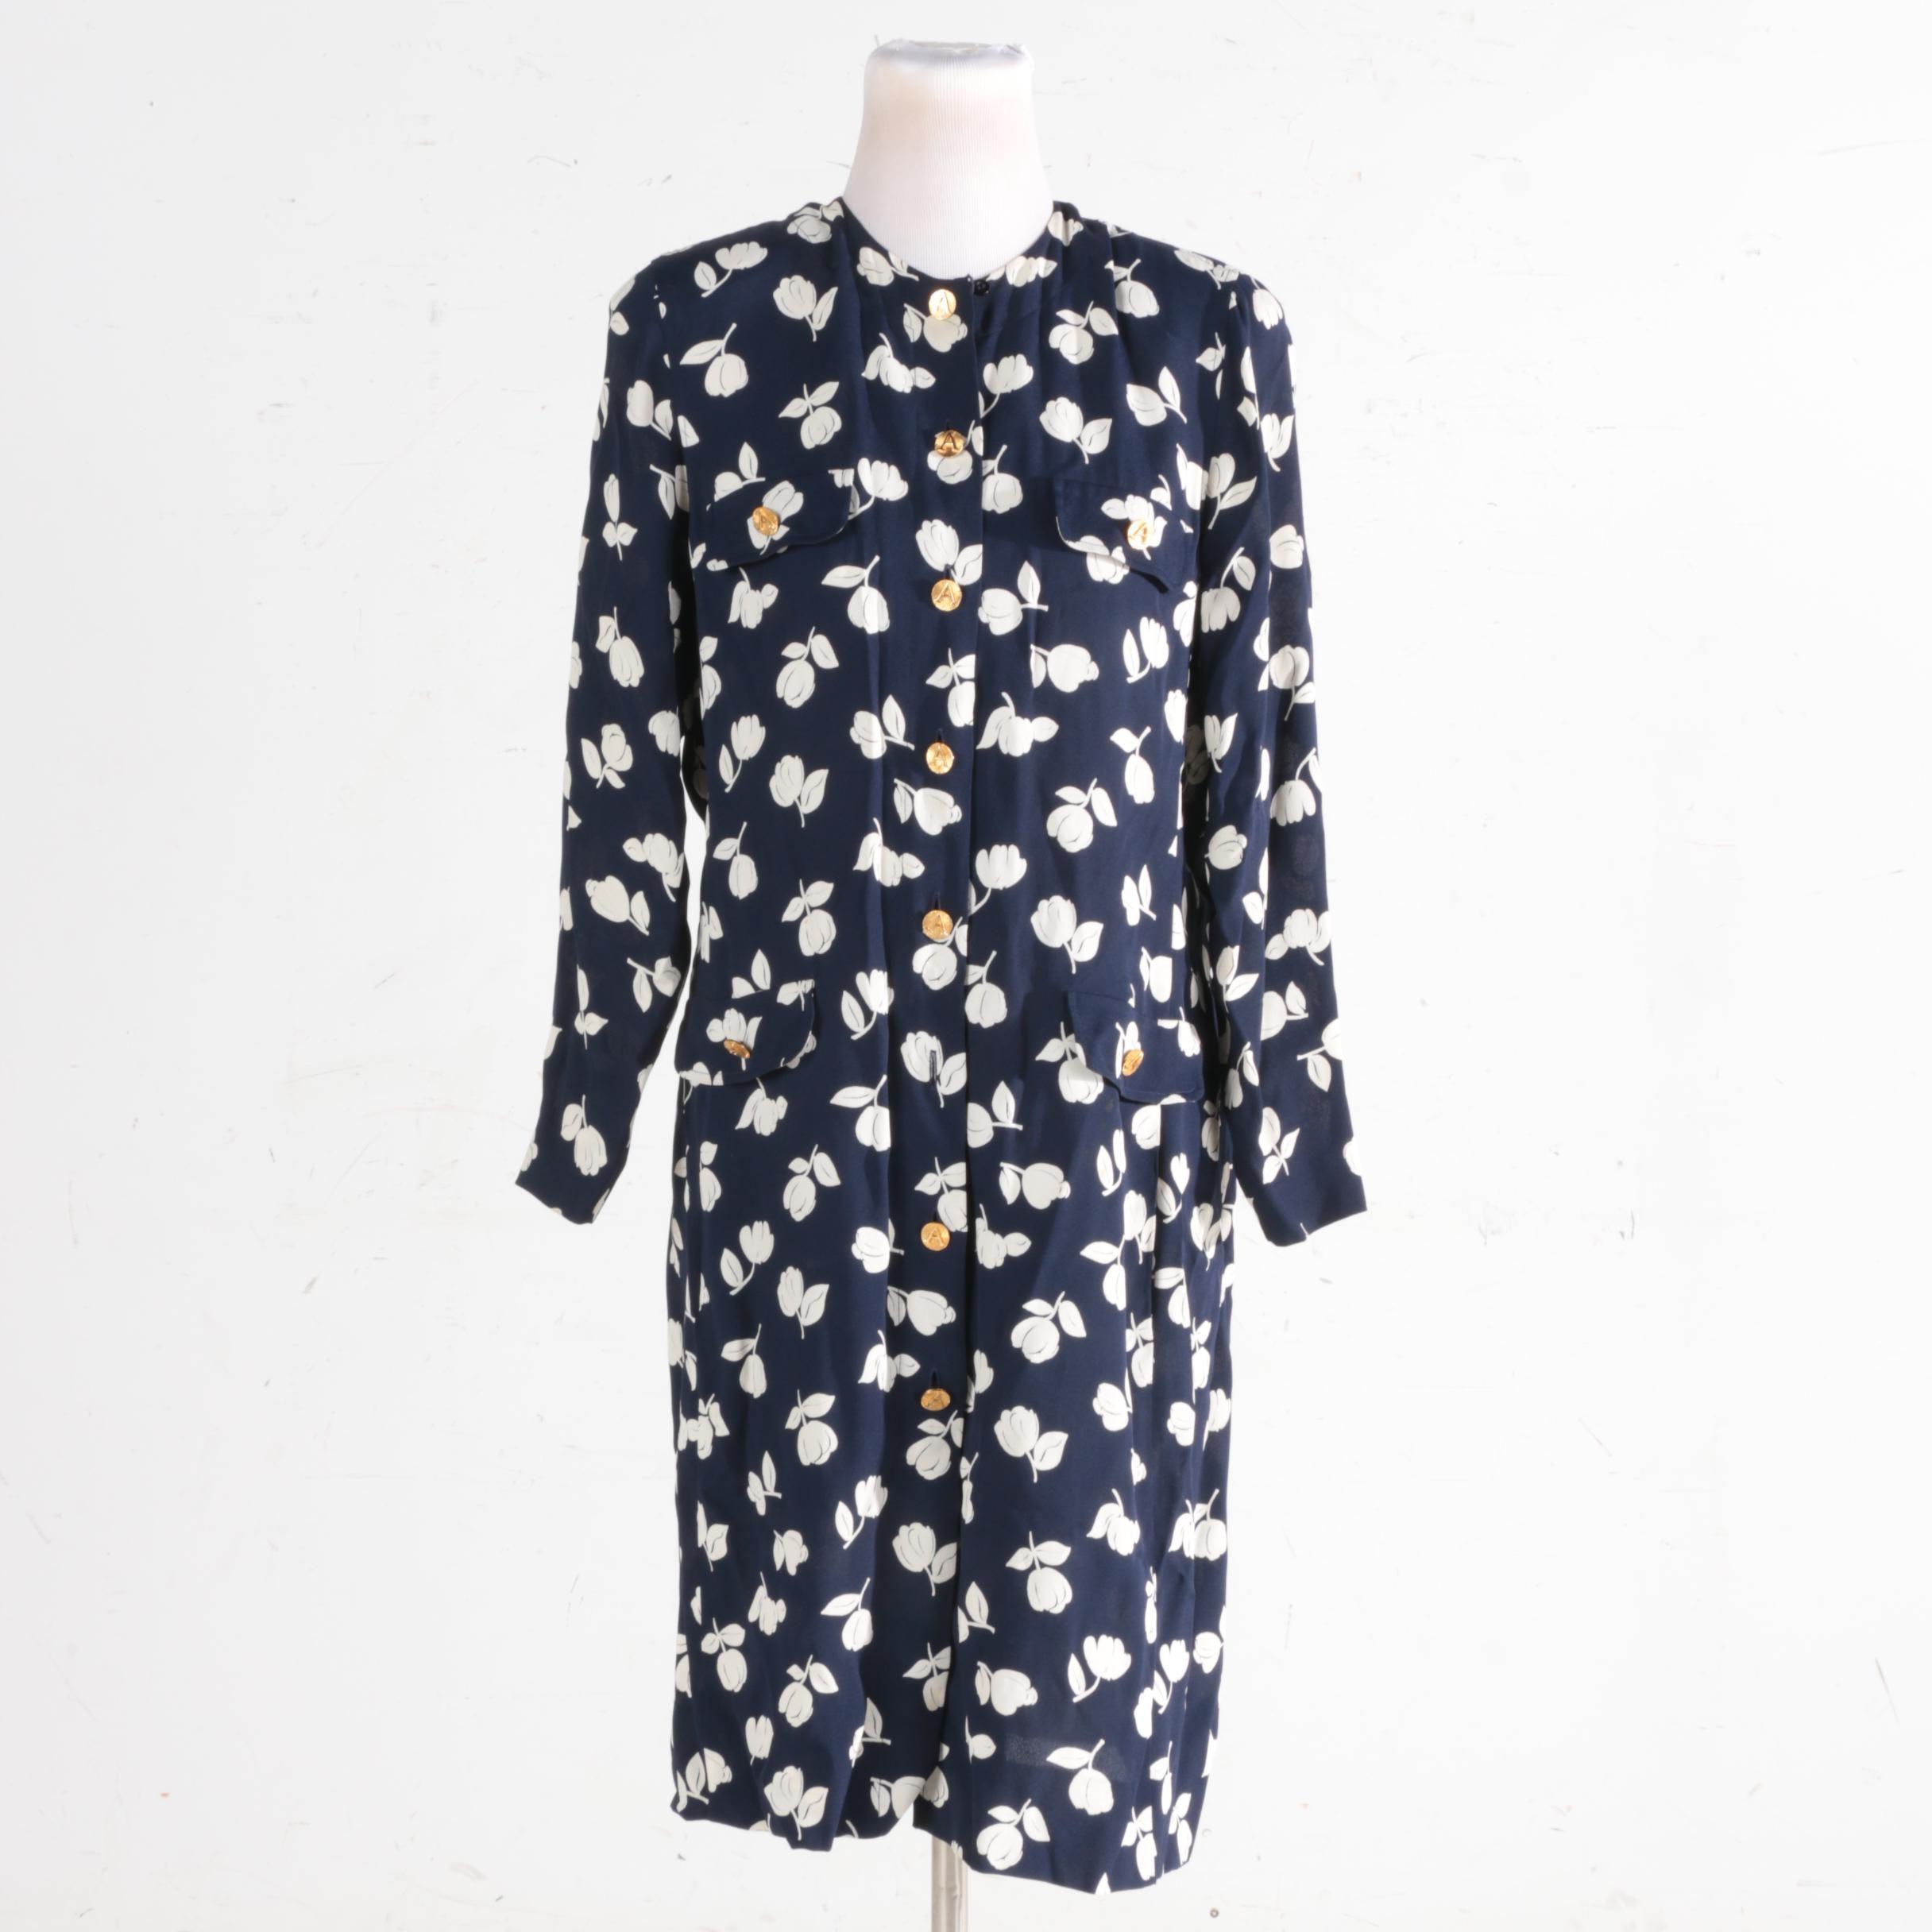 Adolfo Navy Blue Dress